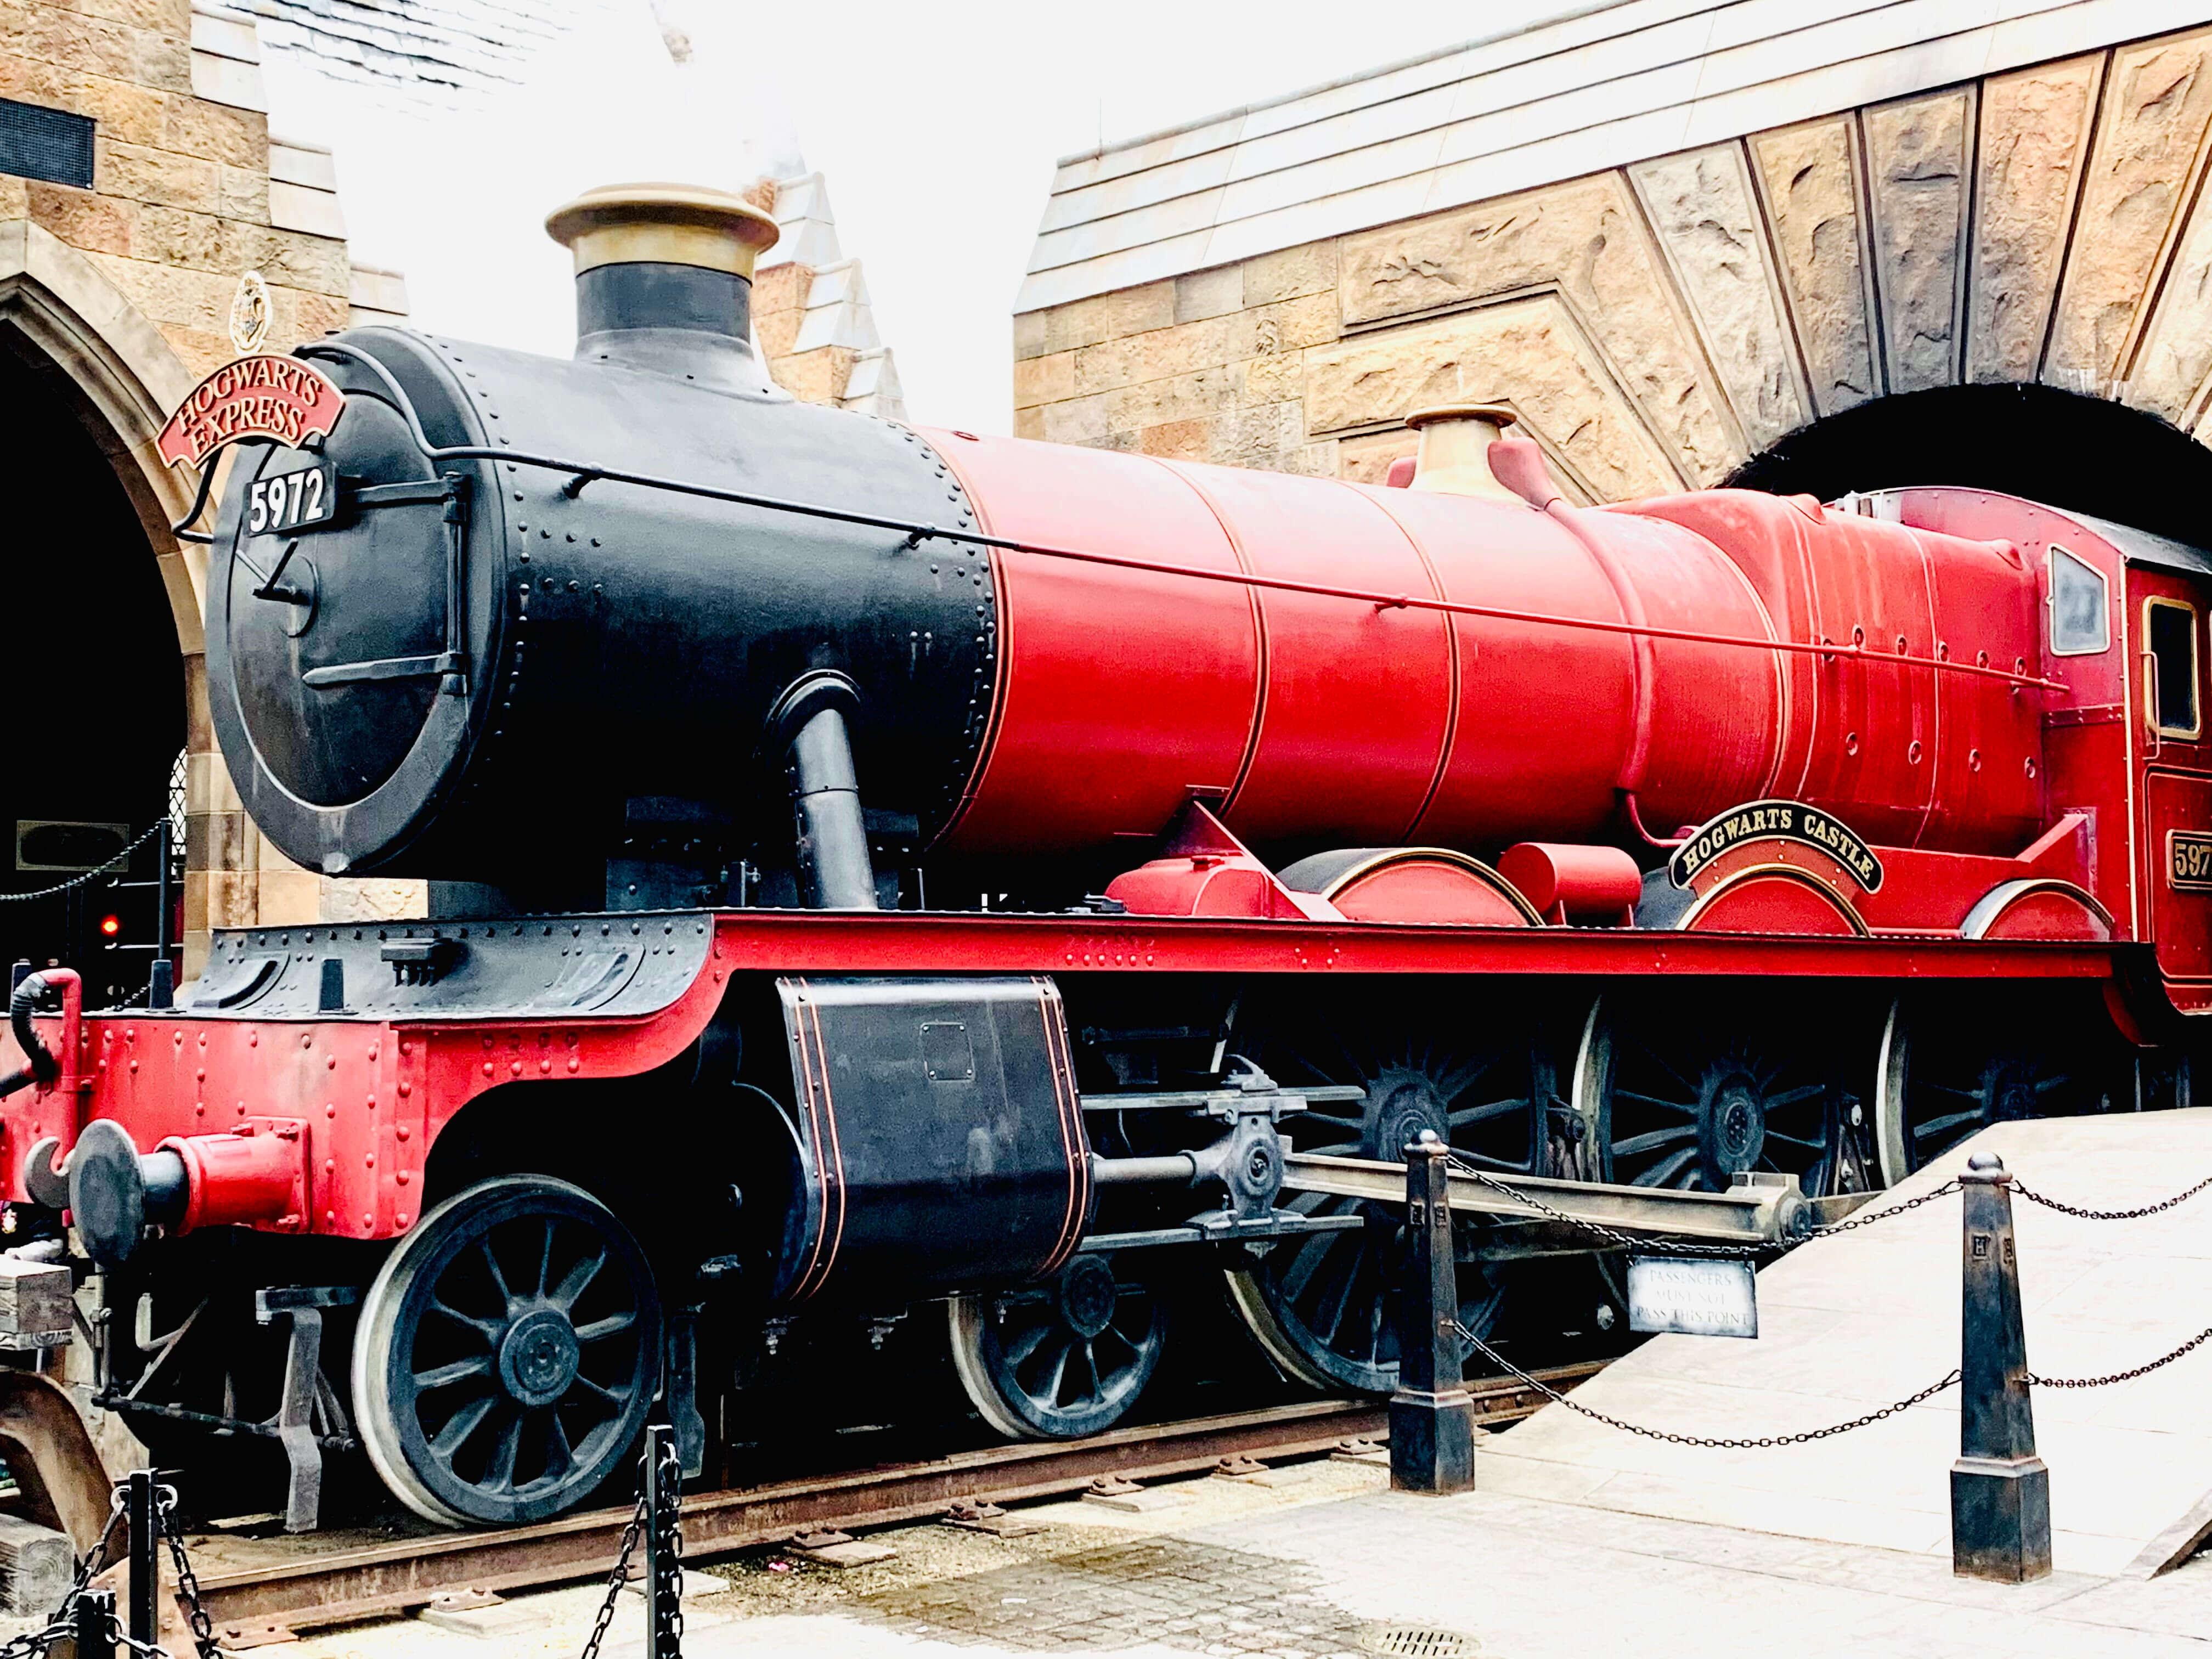 Ride Hogwart's Express as part of your Universal Studios touring plan